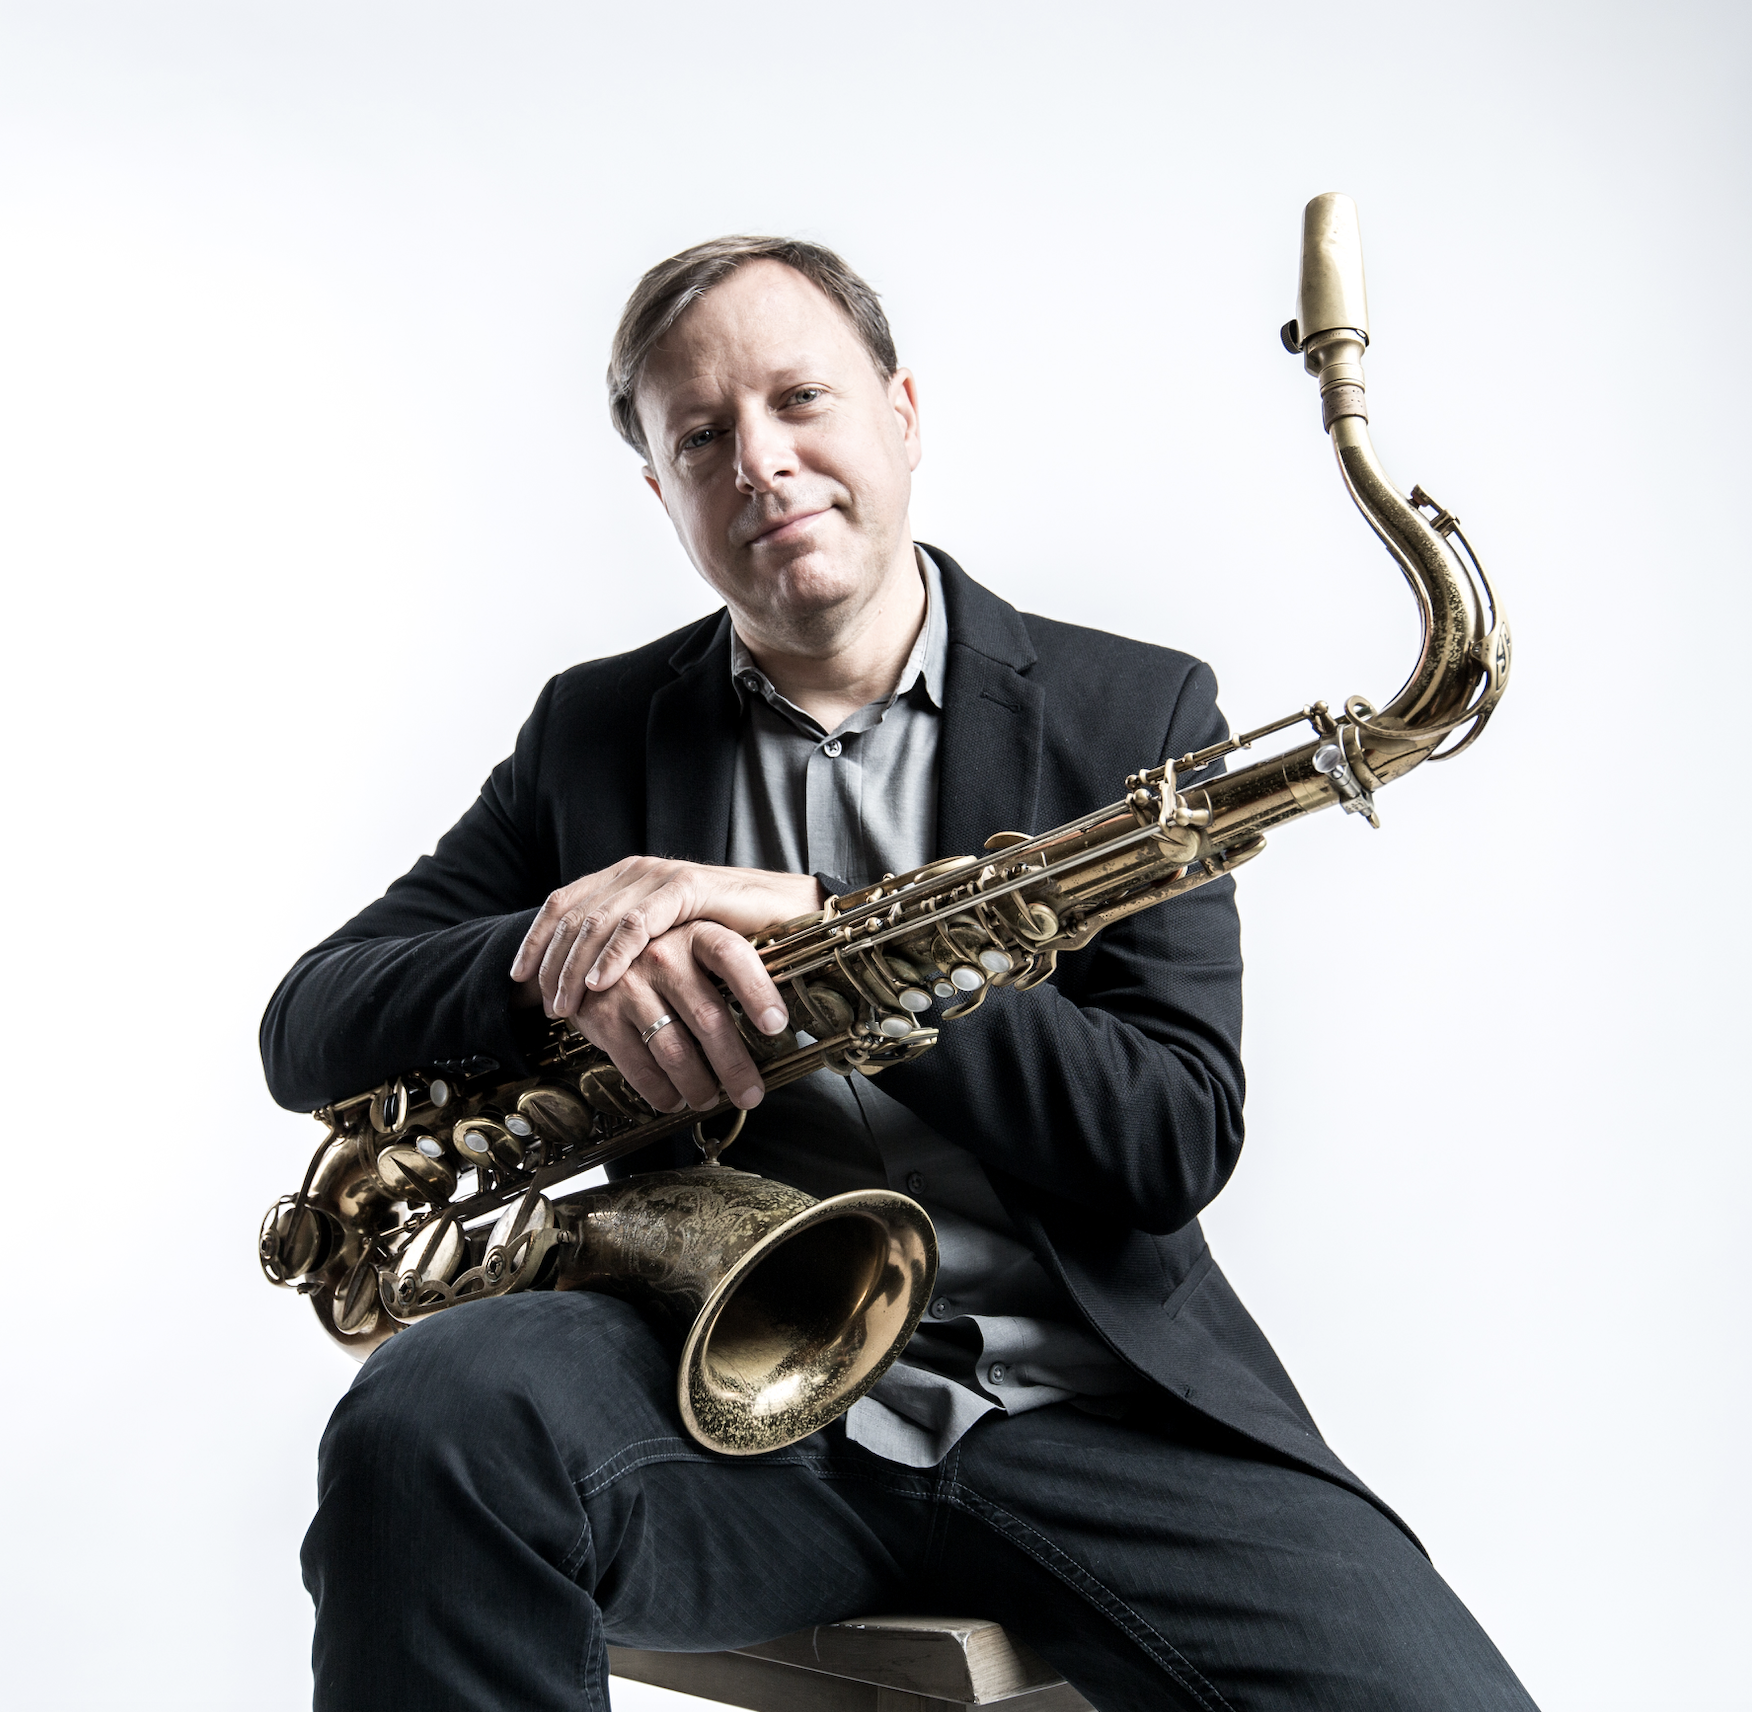 https://cdn2.jazztimes.com/2019/06/Chris-Potter-Saxophone_Dave-Stapleton.png